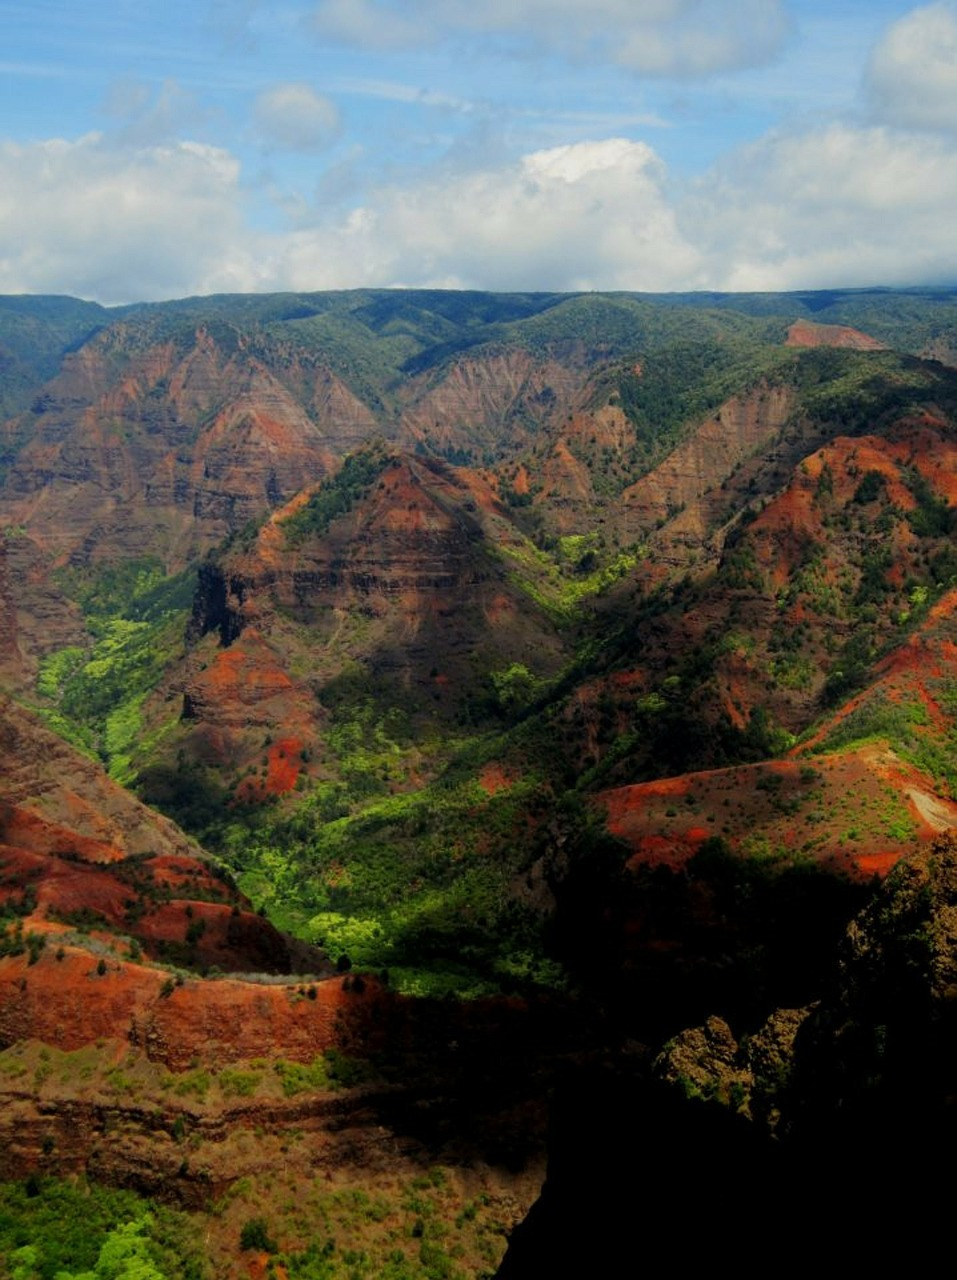 Ein Canyon der es mit den Grand Canyon aufnehmen kann: der Waimea Canyon